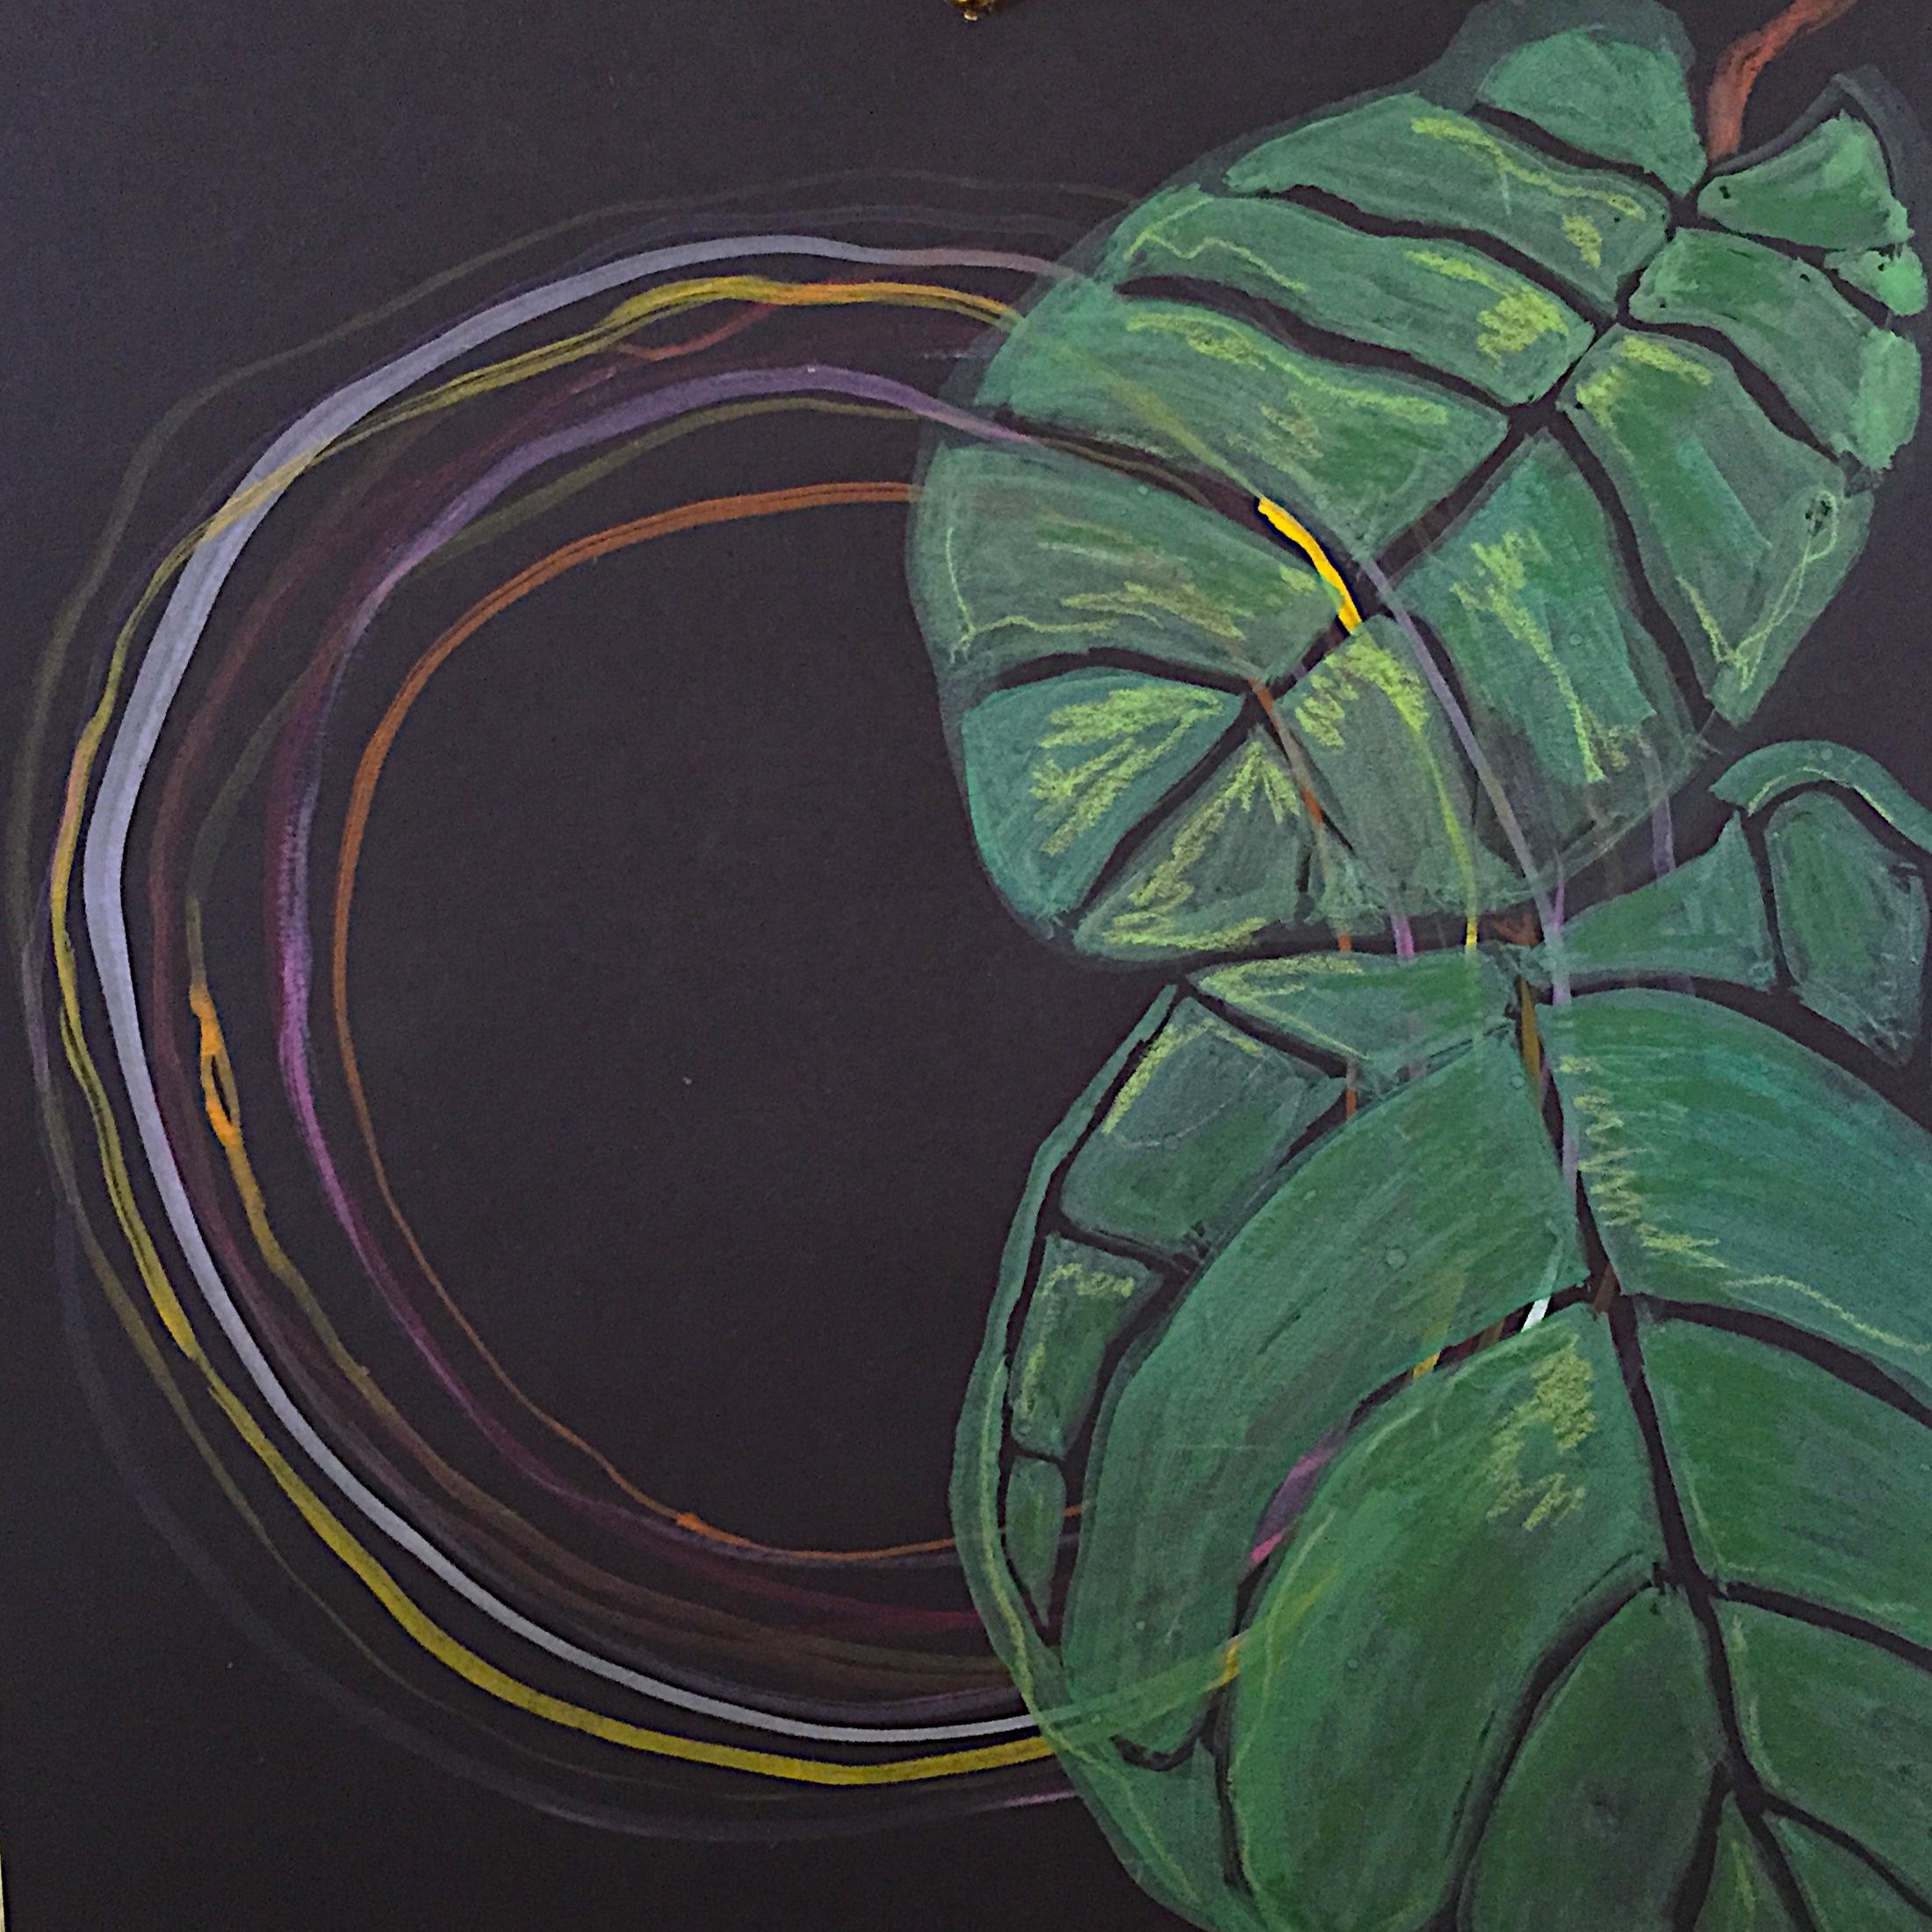 fiddle leaf fig fig.1 \\ 9x9 mixed media on paper  >> S O L D <<